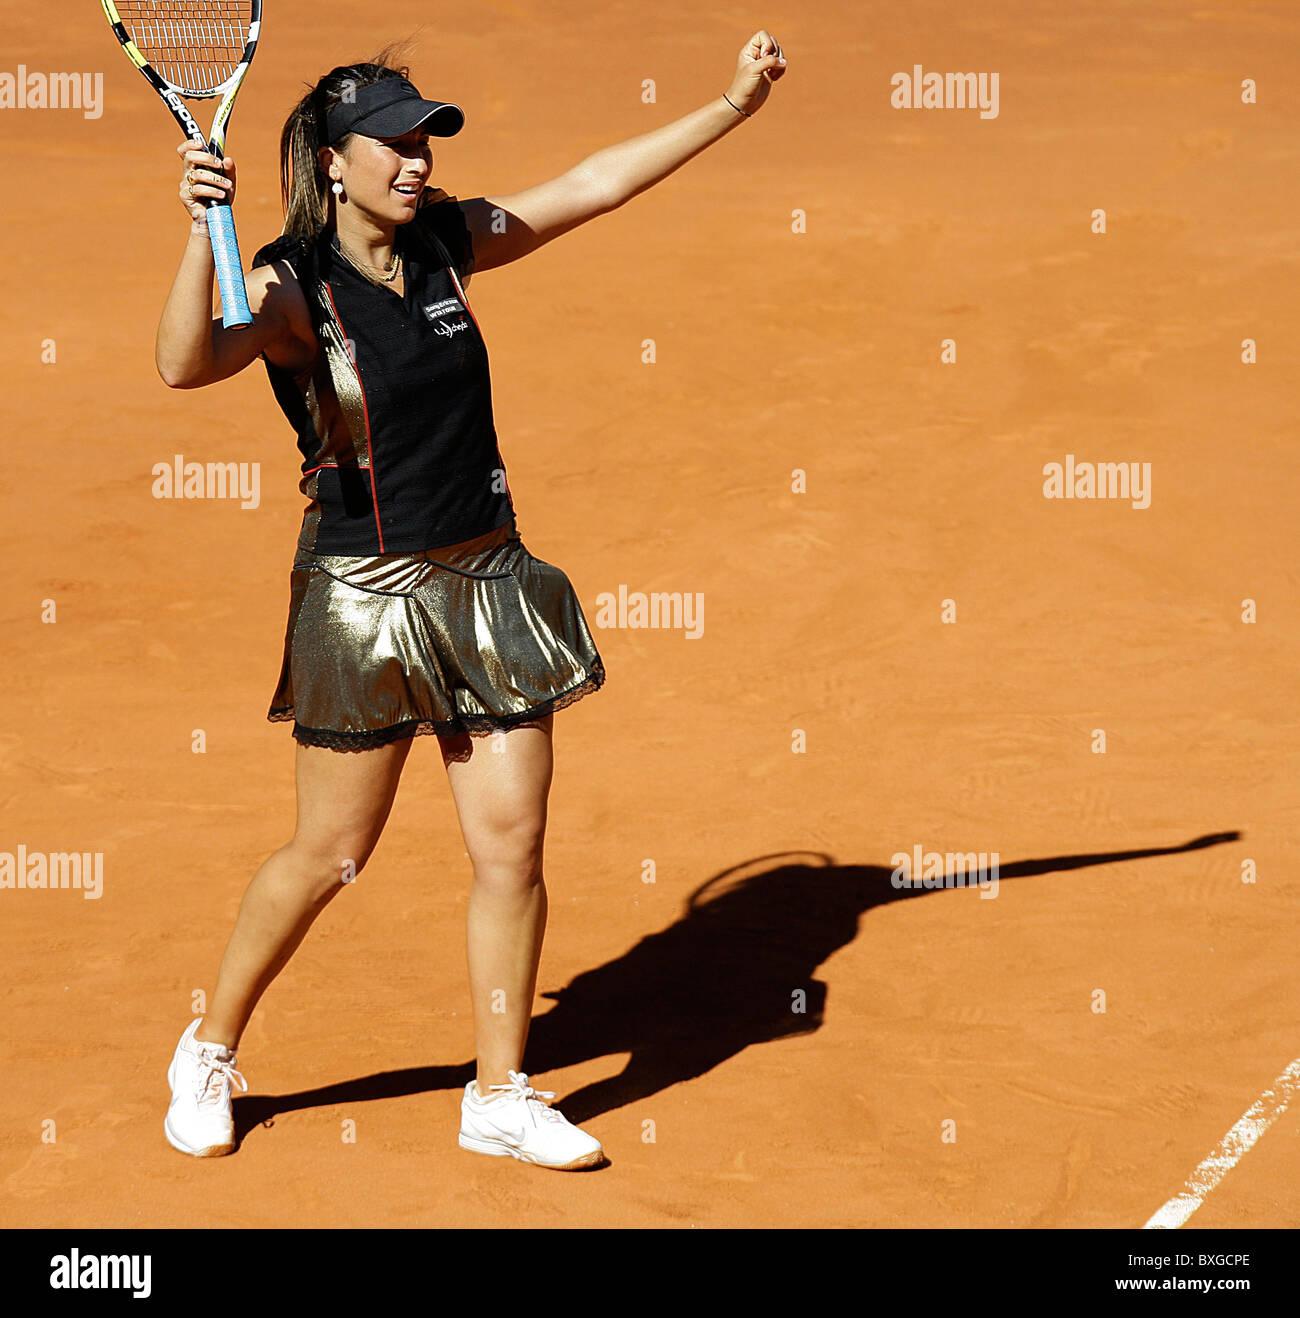 Aravane Rezai (FRA) in action against Venus Williams during the Women's WTA Singles Final - Stock Image